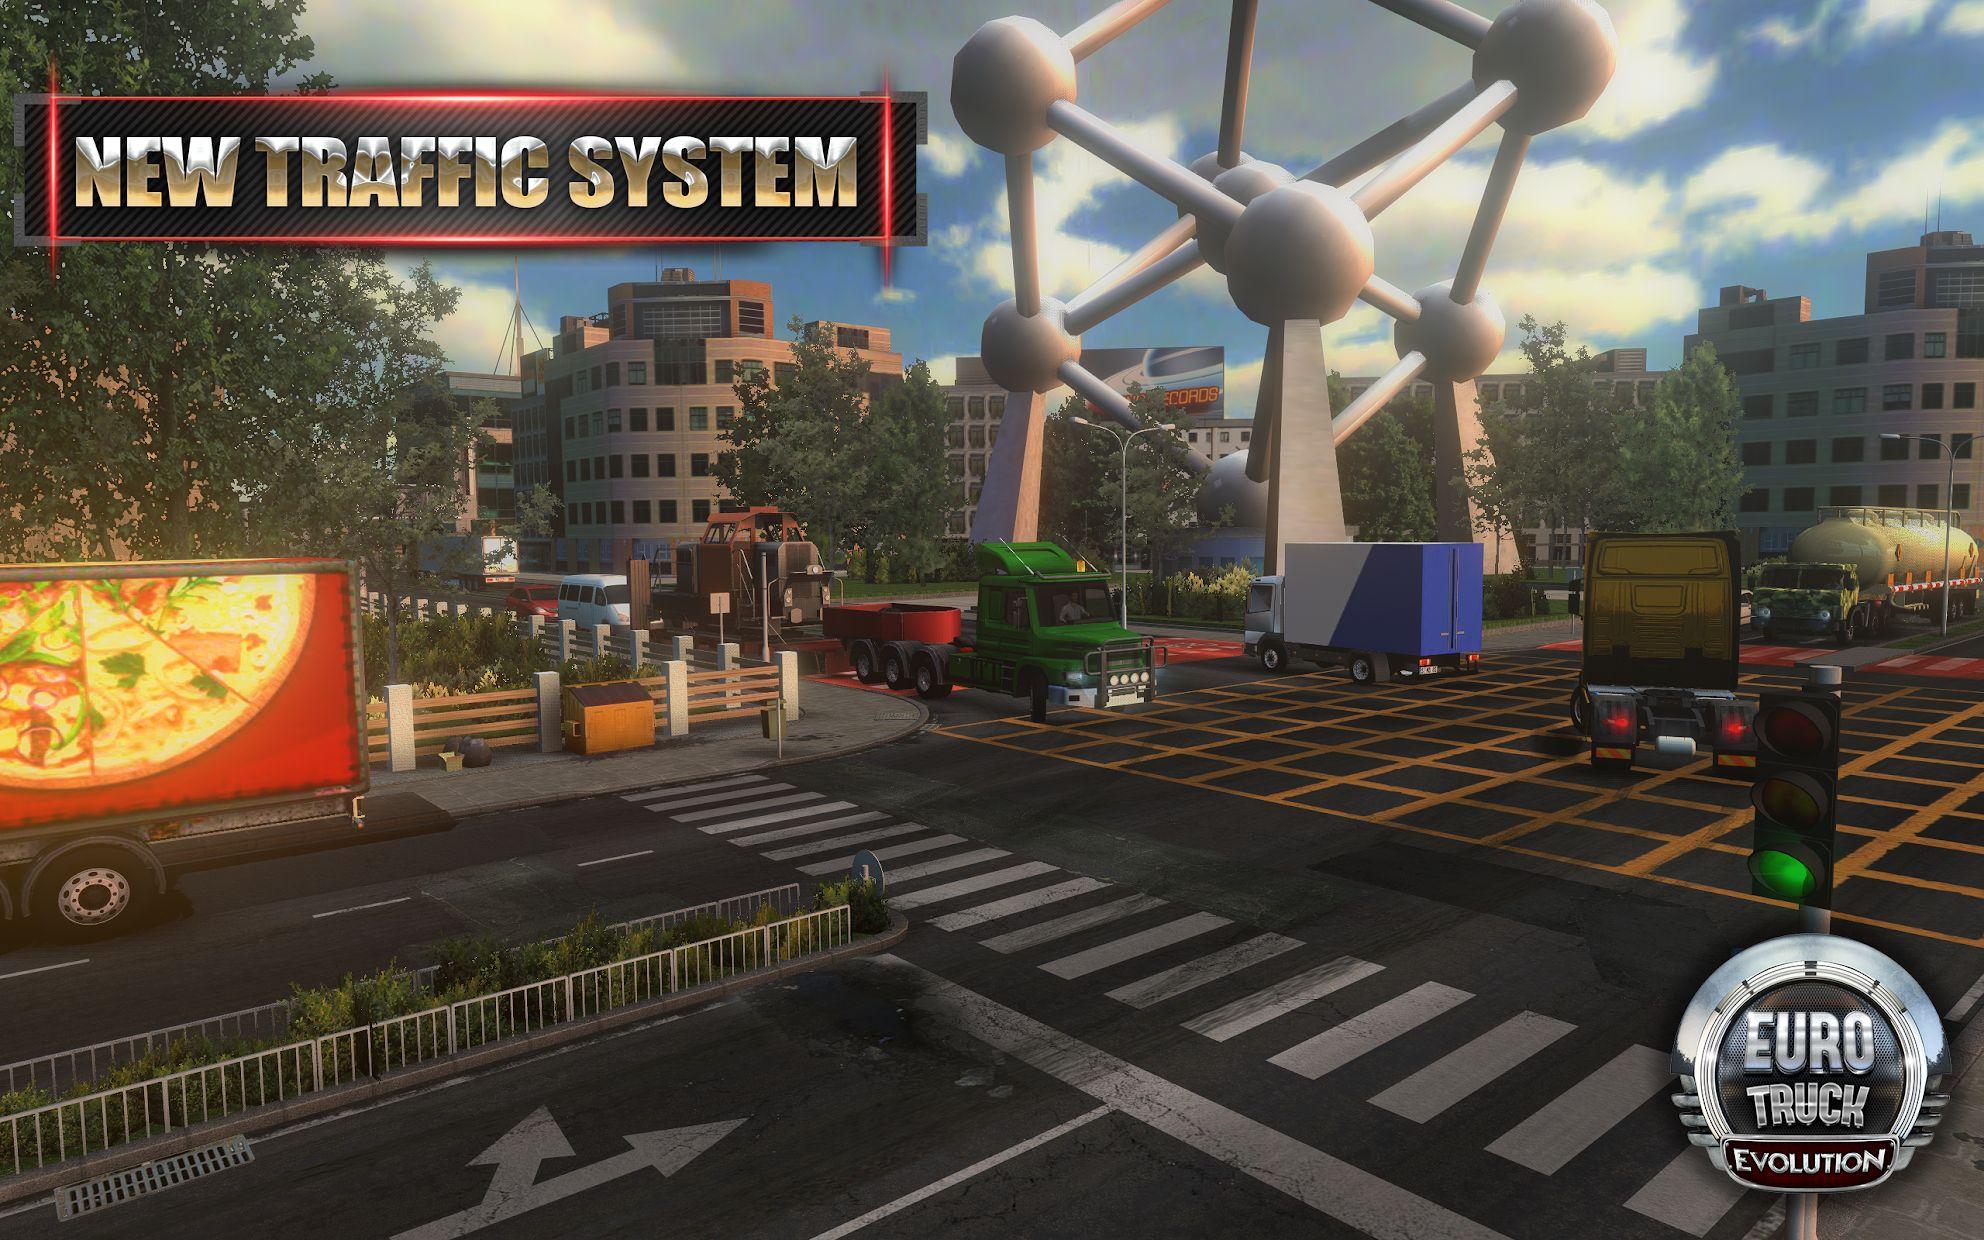 Euro Truck Evolution (Simulator) 游戏截图2